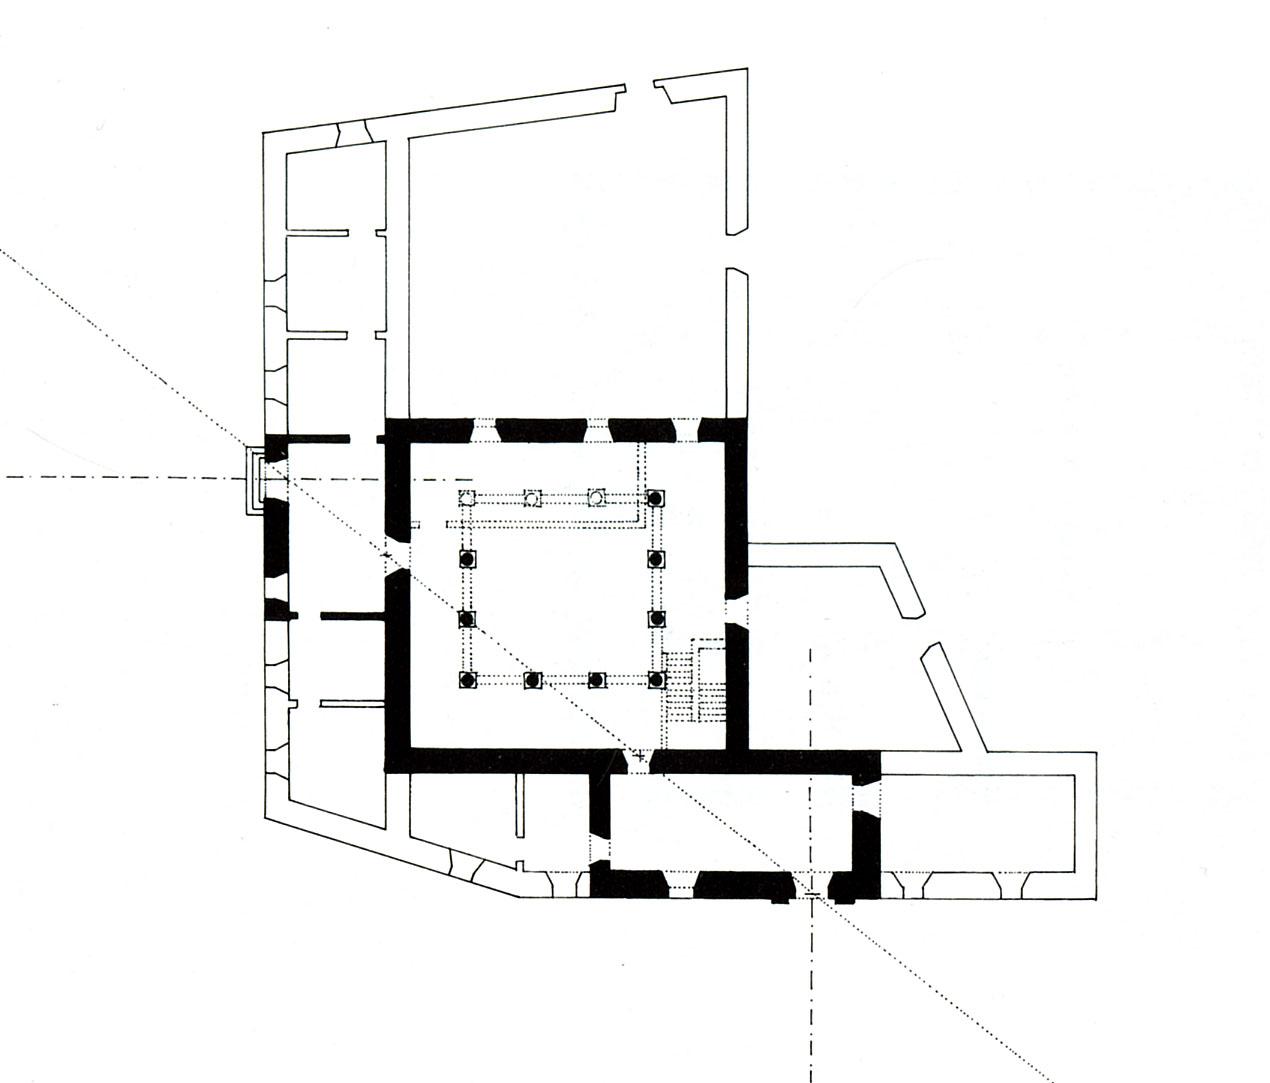 M Ster En Arquitectura Documentaci N Arquitectura